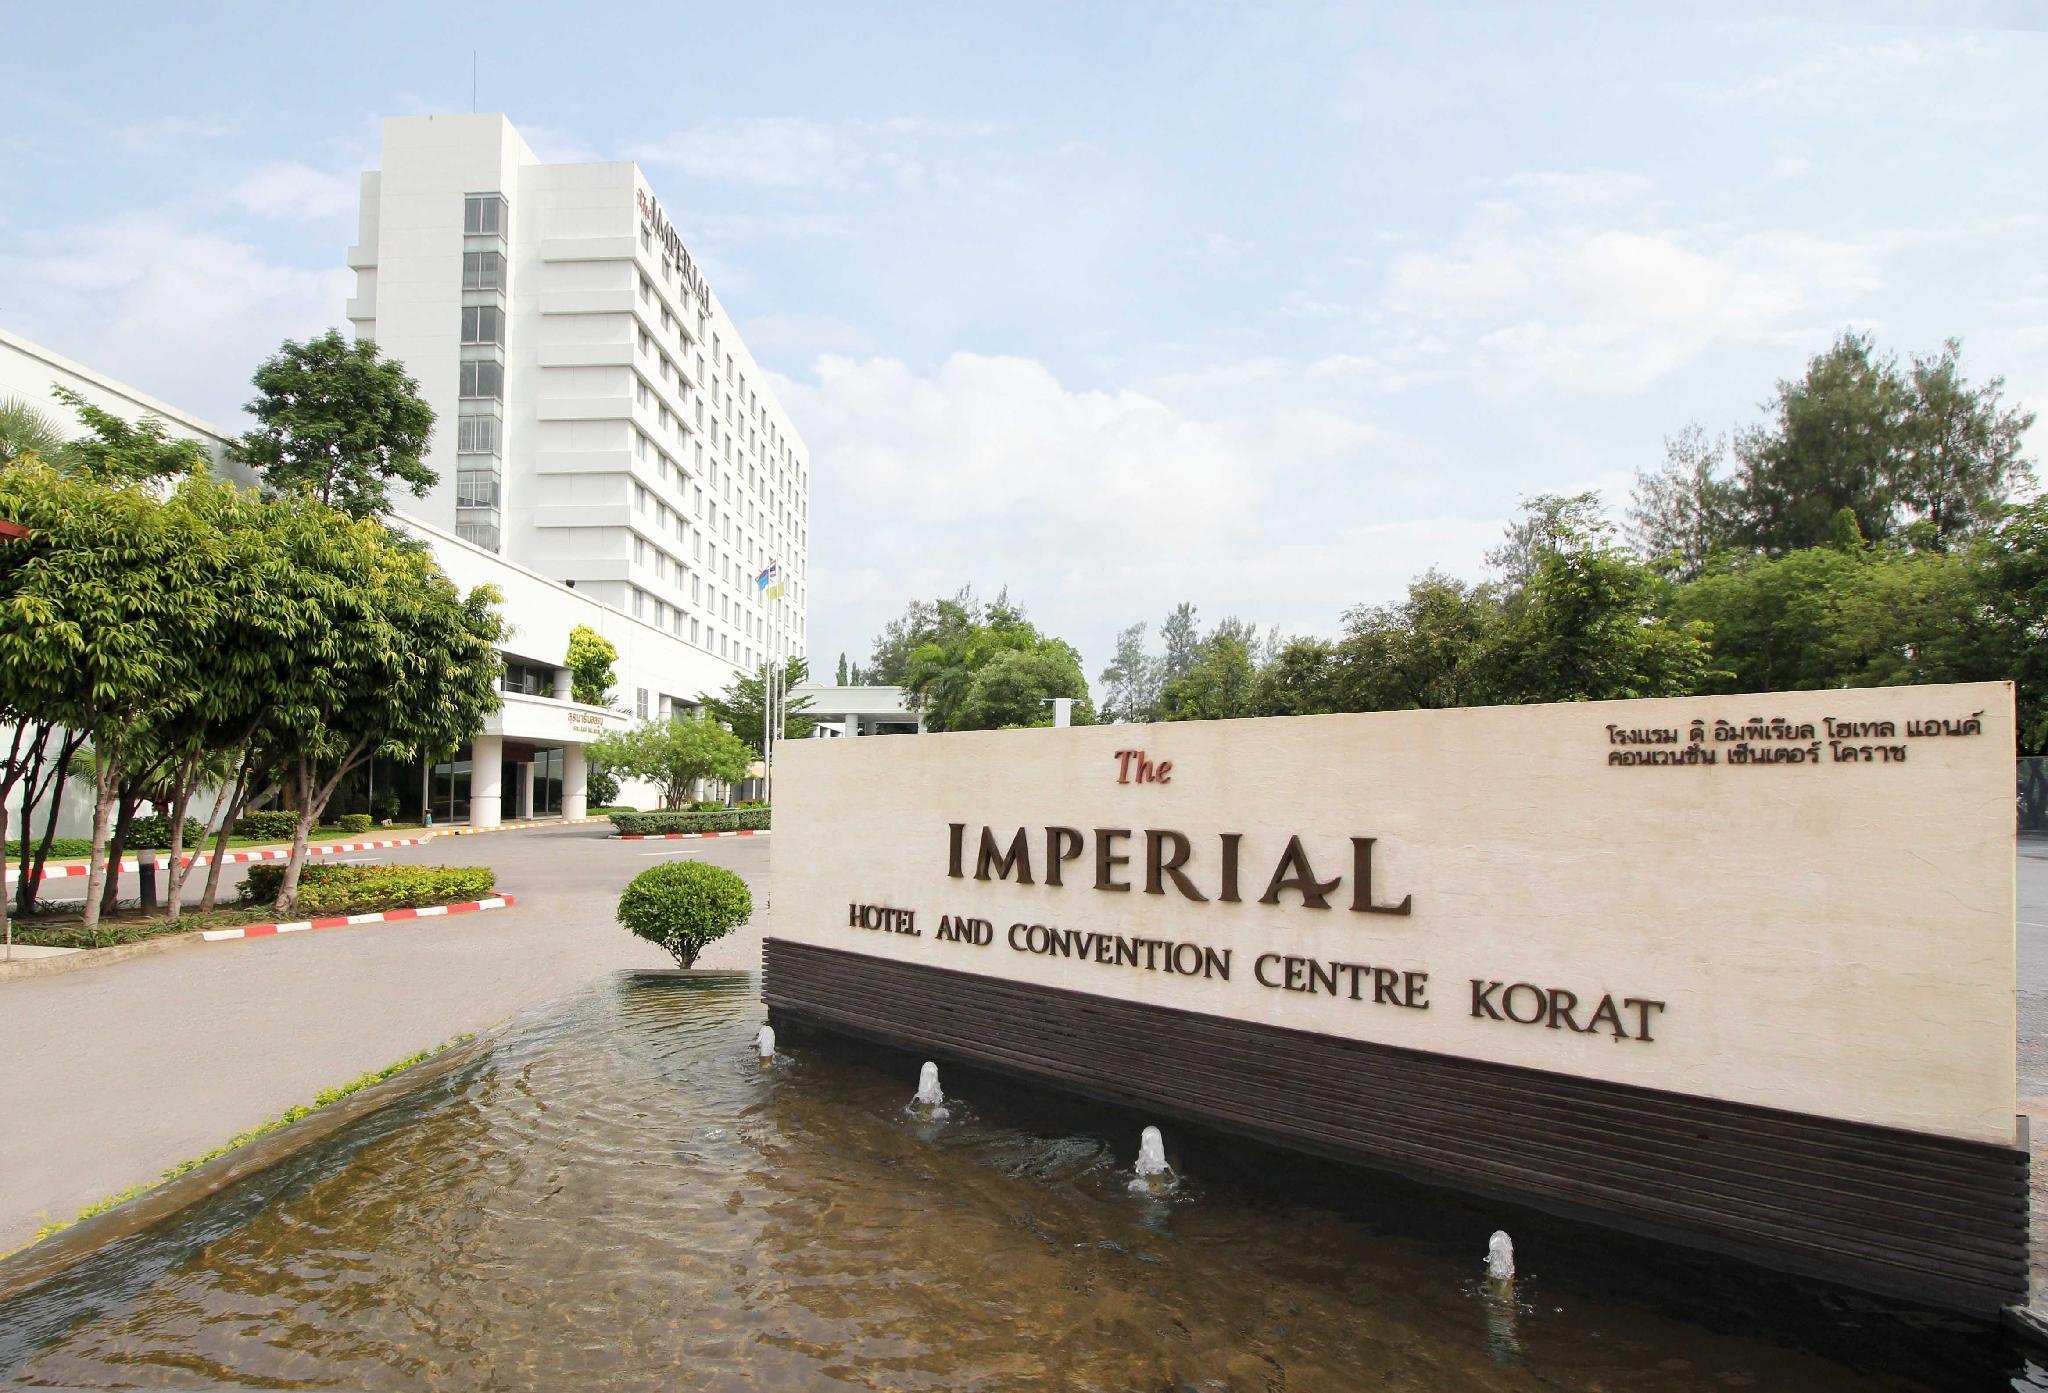 The Imperial Hotel and Convention Centre Korat ดิ อิมพีเรียล โฮเต็ล แอนด์ คอนเวนชั่น เซ็นเตอร์ โคราช